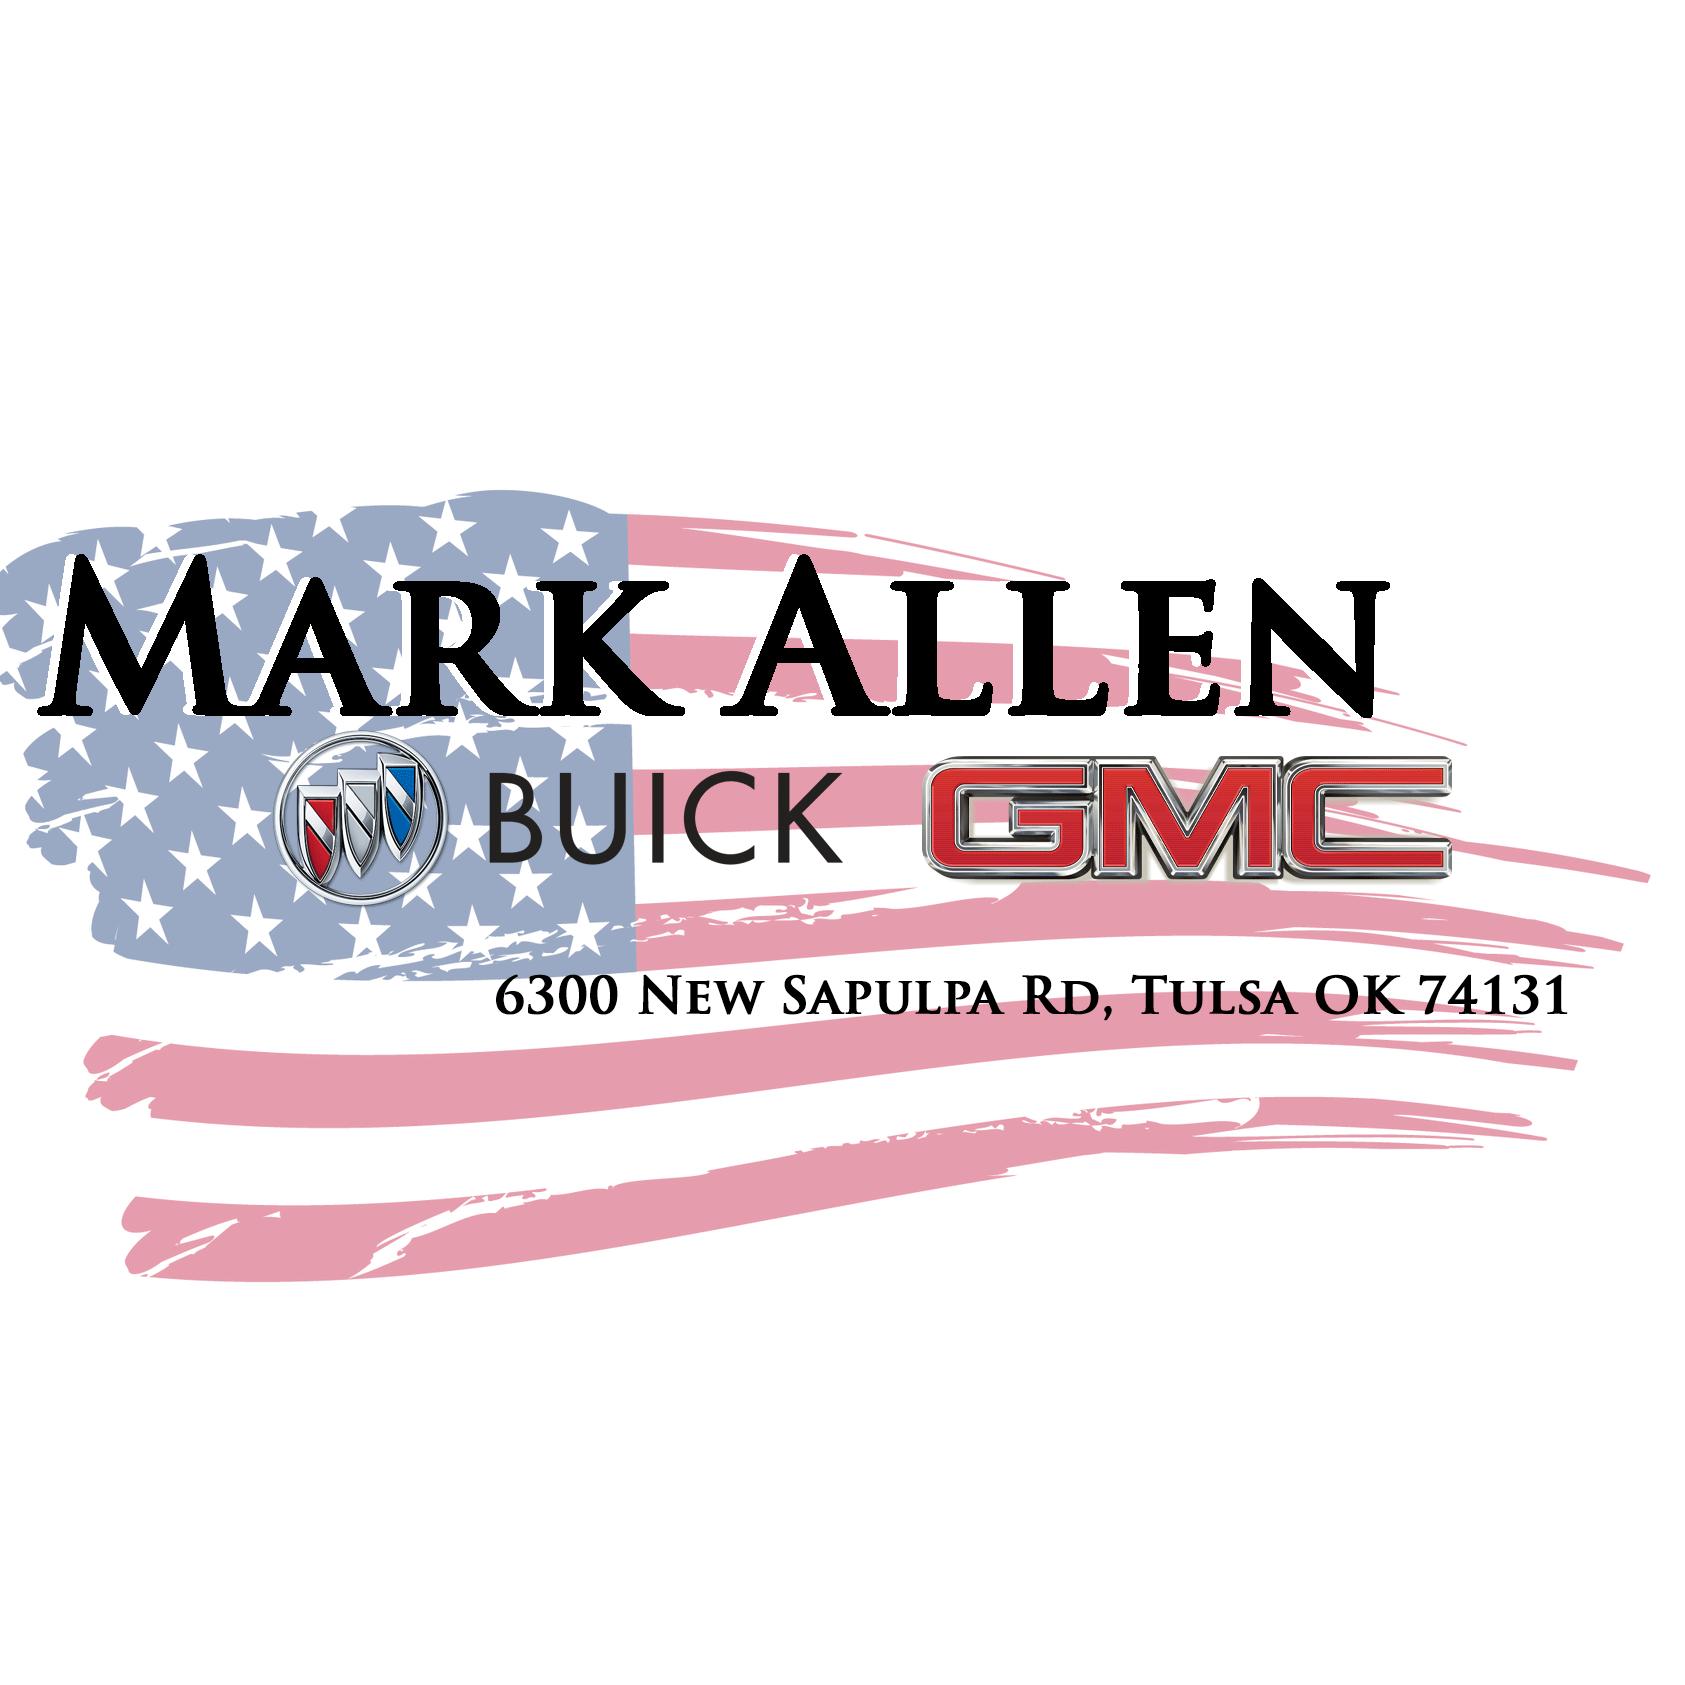 Mark Allen Buick GMC - Tulsa, OK - Auto Dealers